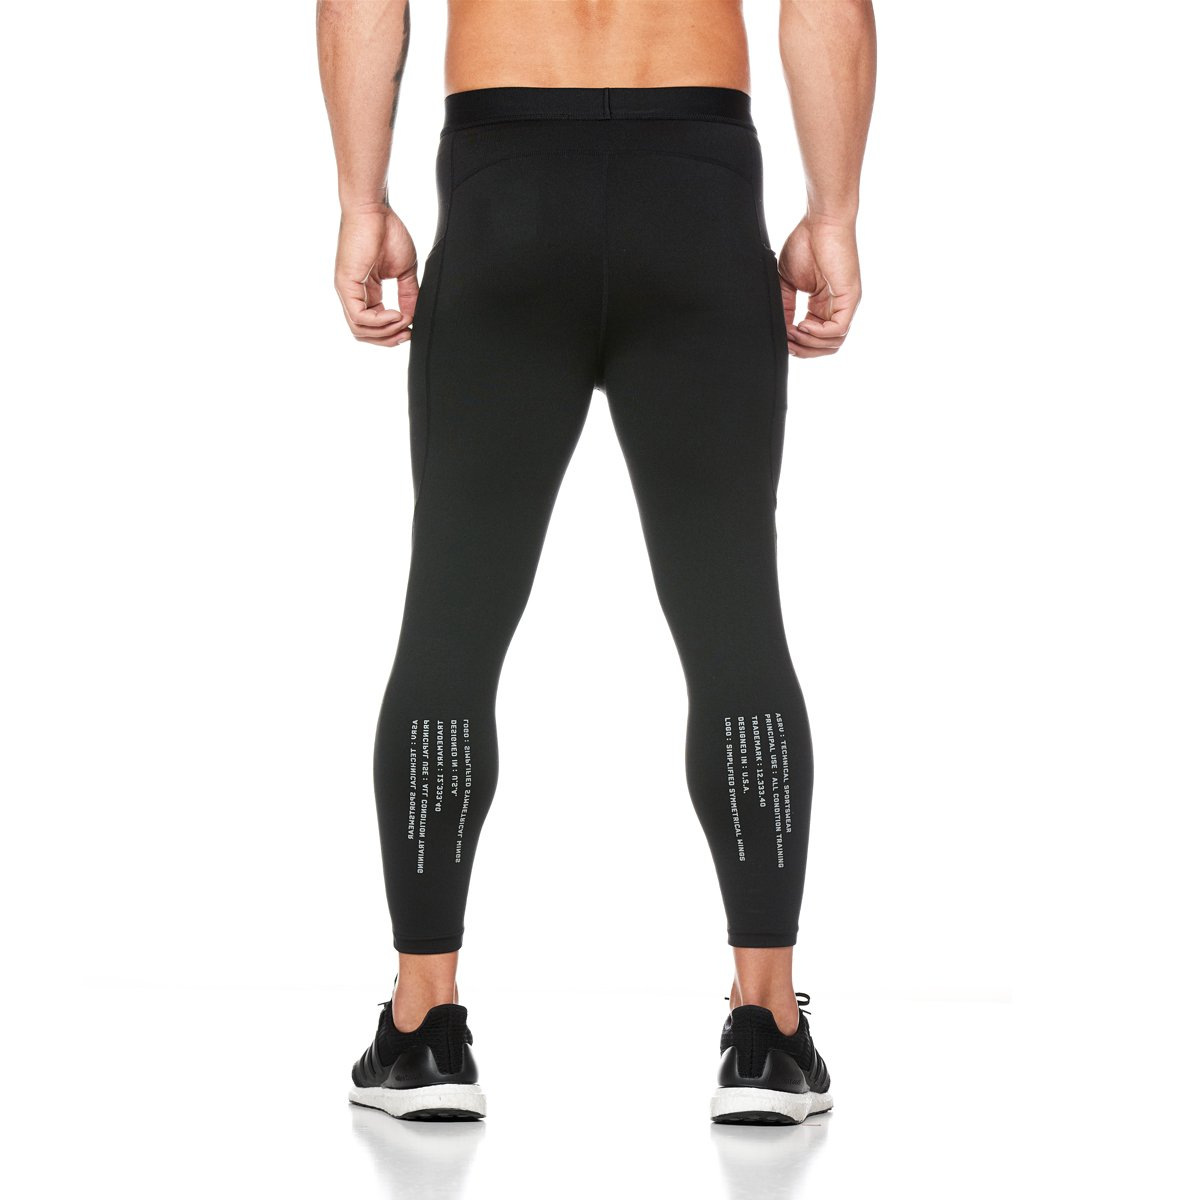 basketball trousers fashionable pant - HD1200×1200